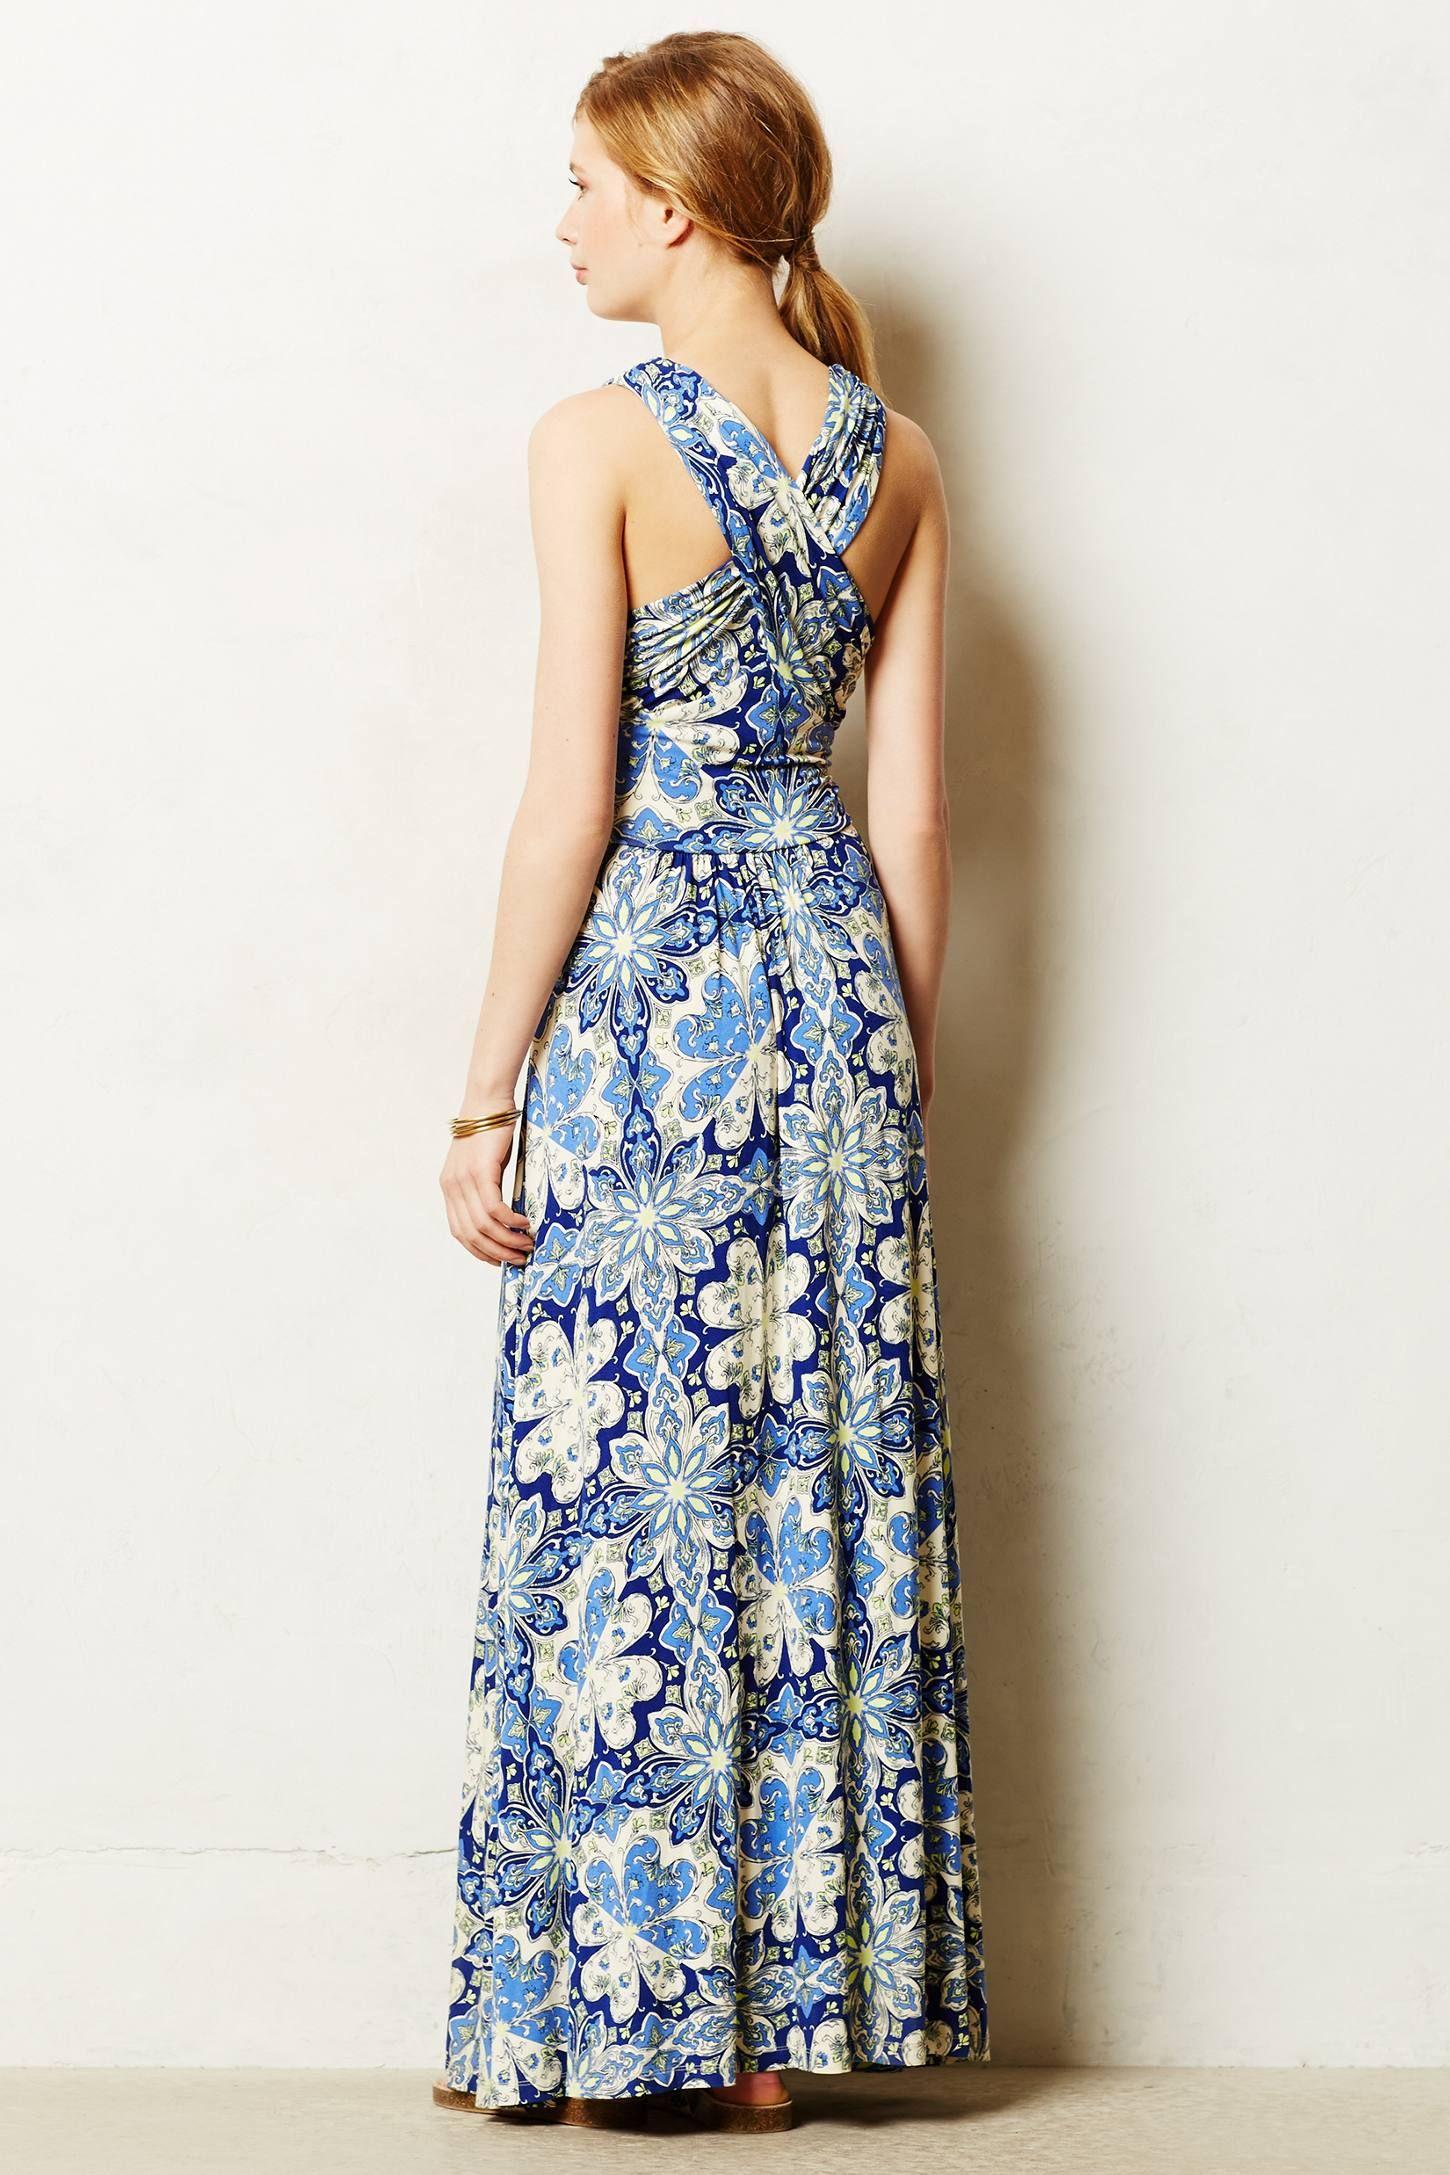 7d3ee3e5620c Capuchina Dress - anthropologie.com | Spring & Summer Fashions ...